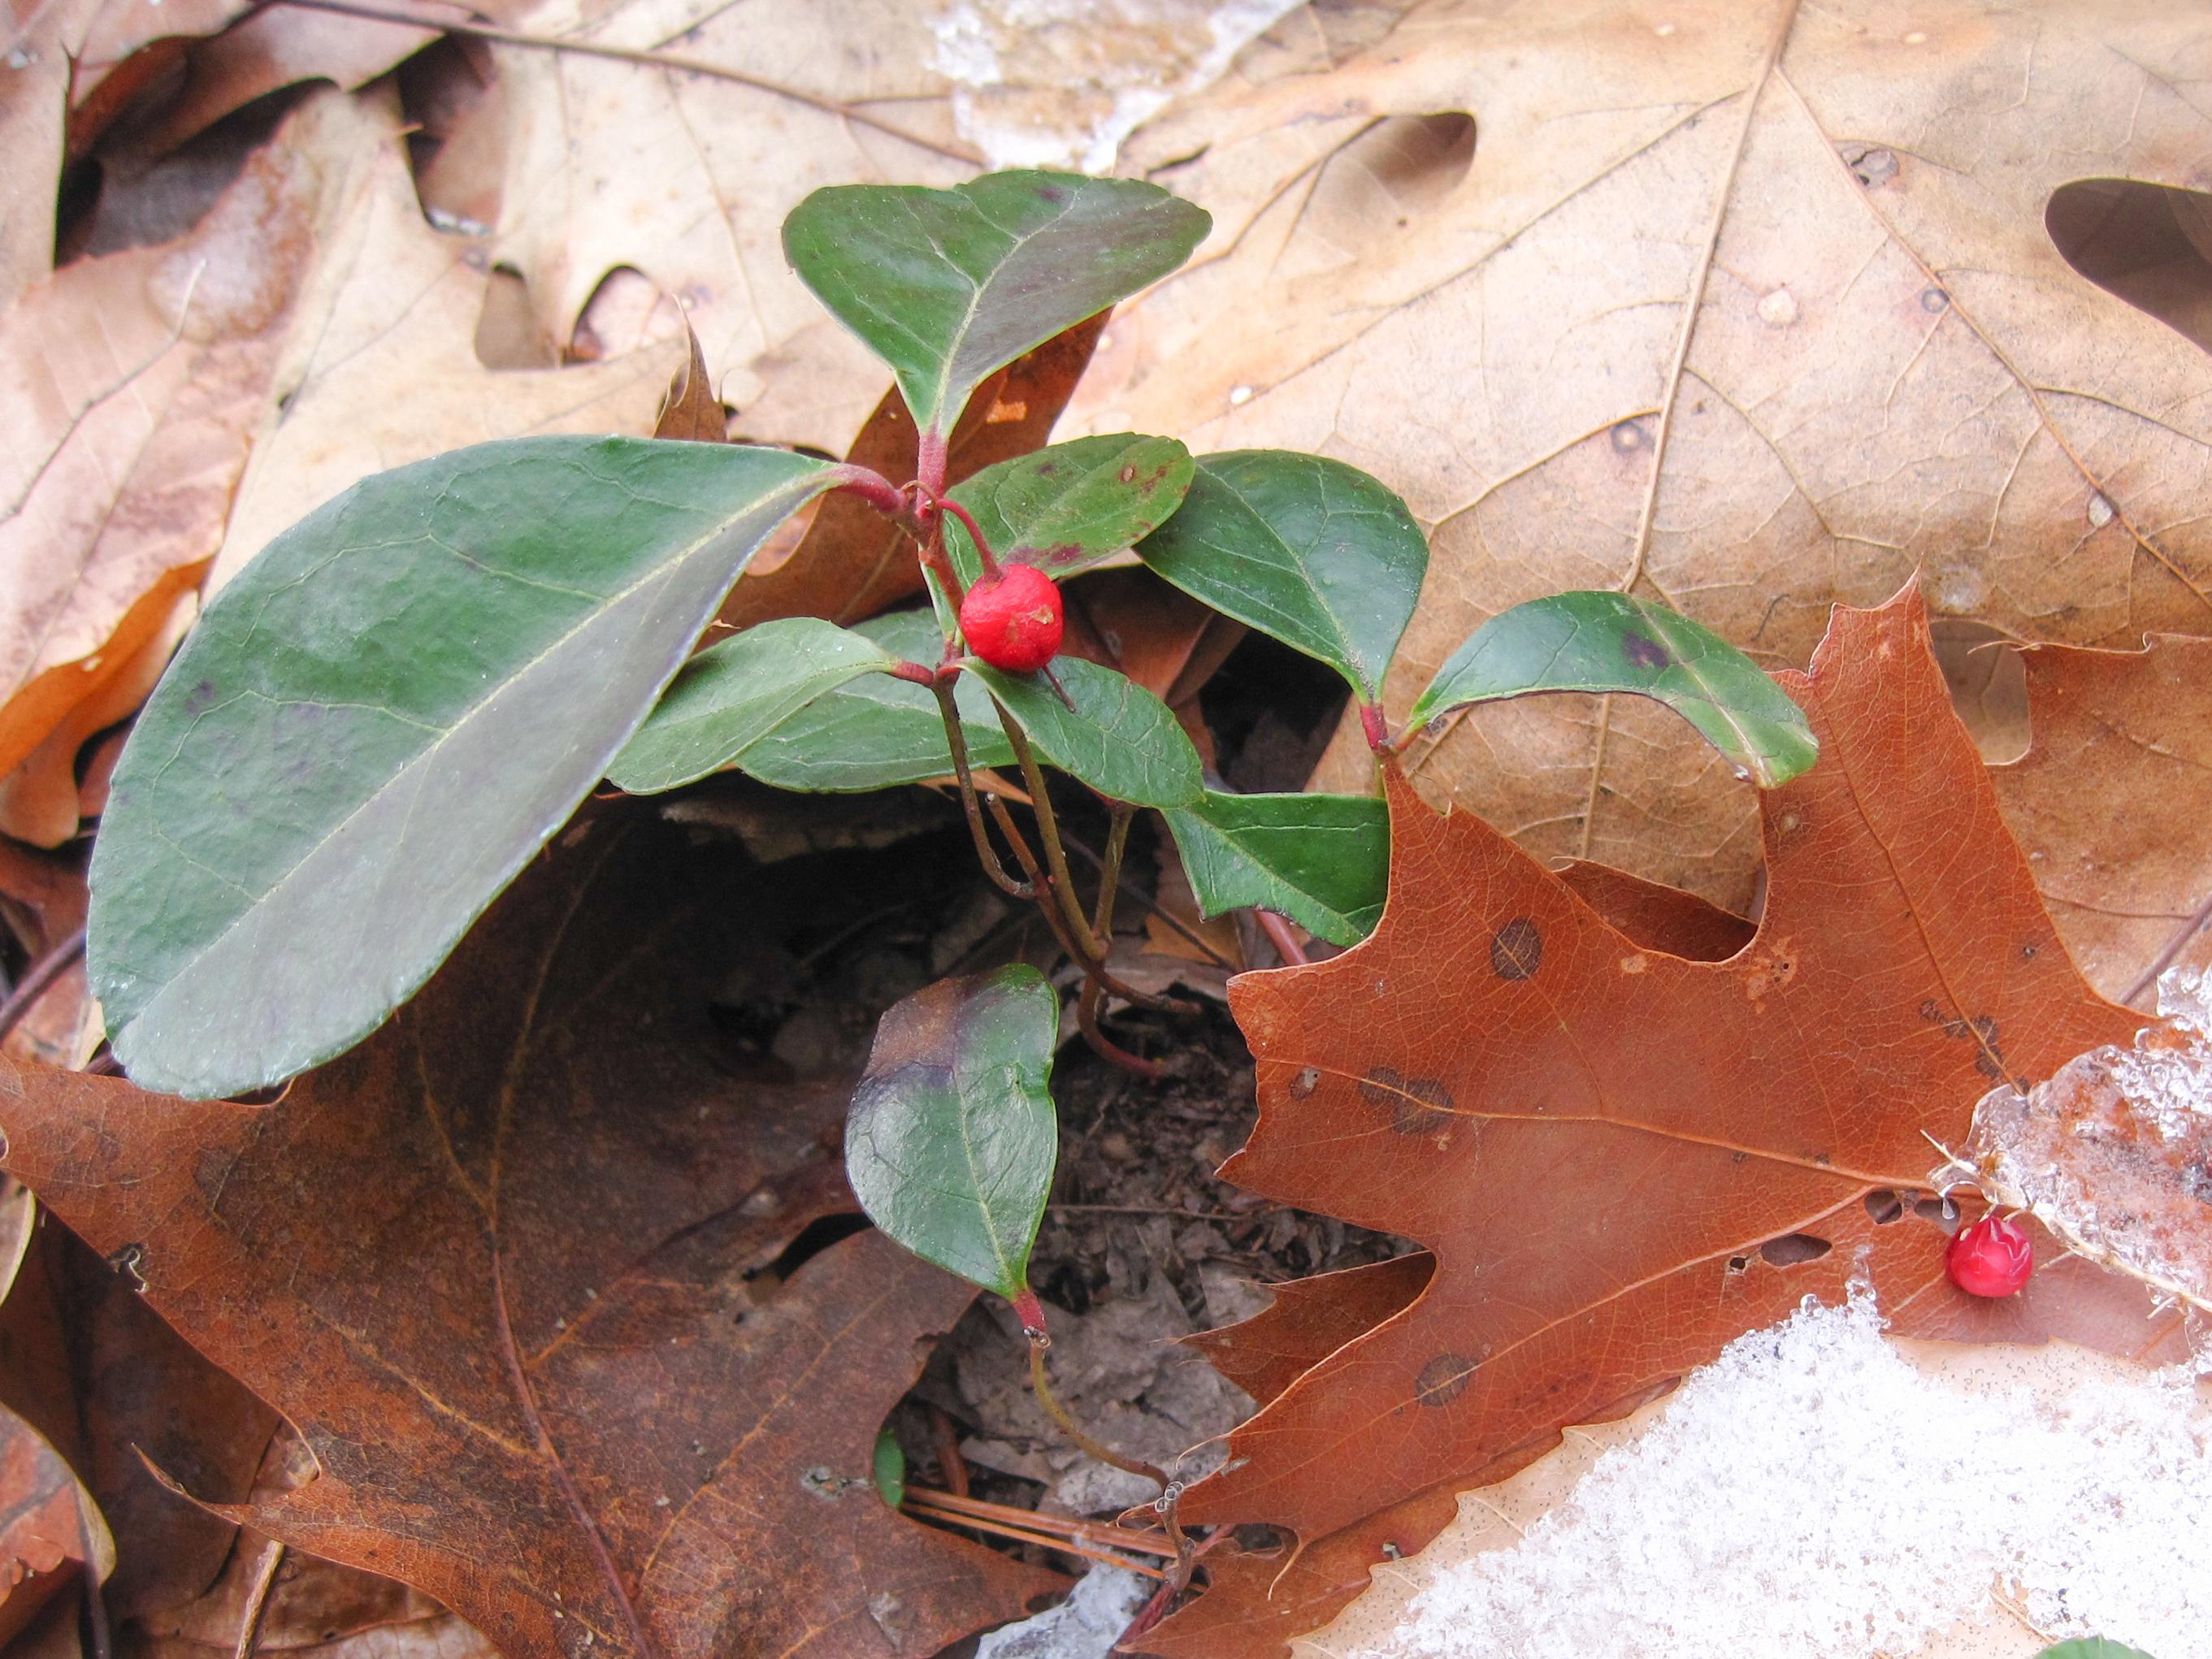 All About Wintergreen, aka Gaultheria procumbens